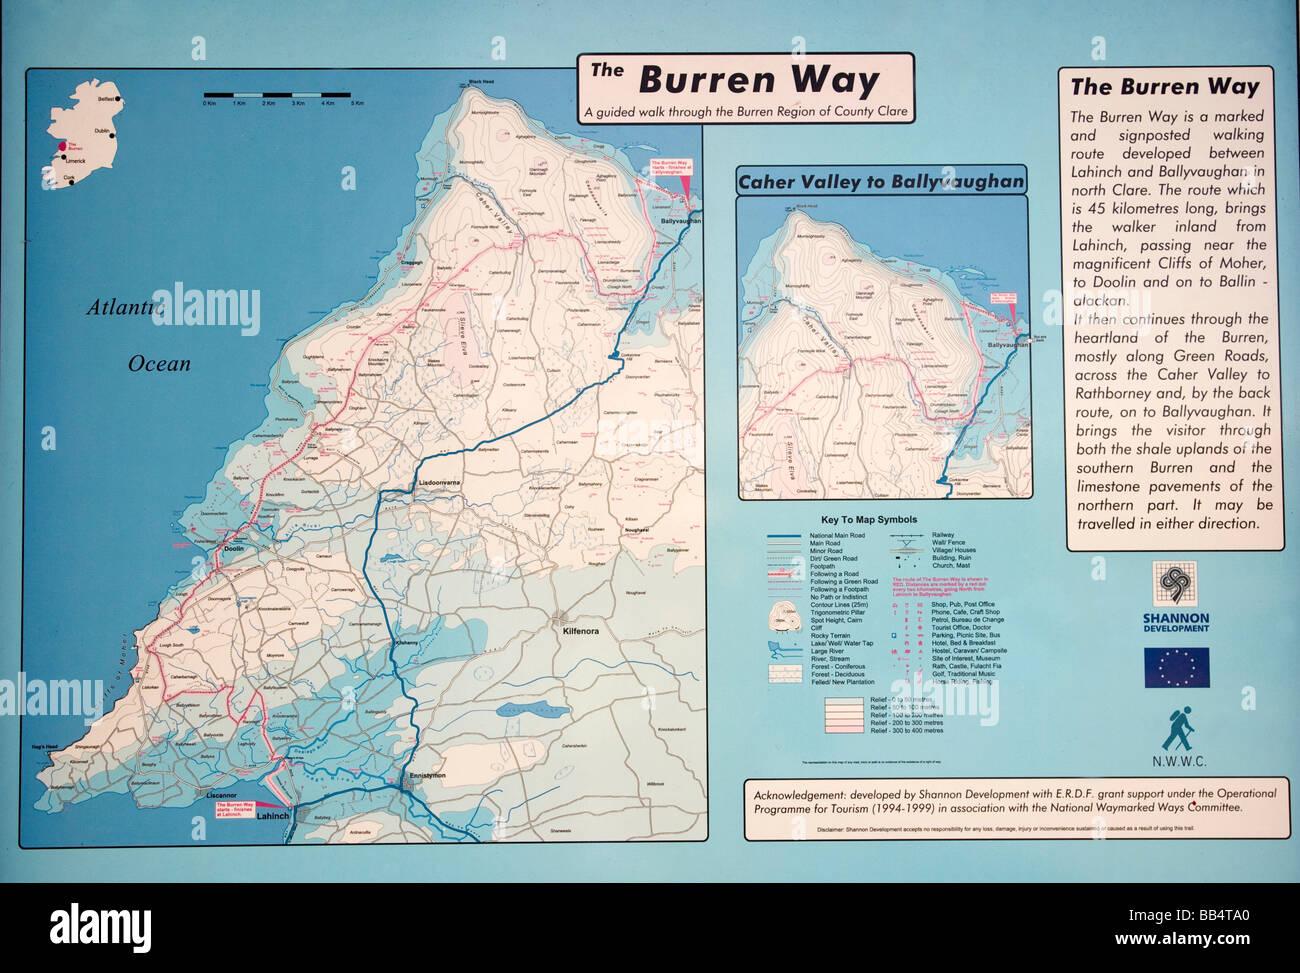 Map Of The Burren Ireland.Europe Ireland Ballyvaughan Map Of The Burren Way Hiking Path